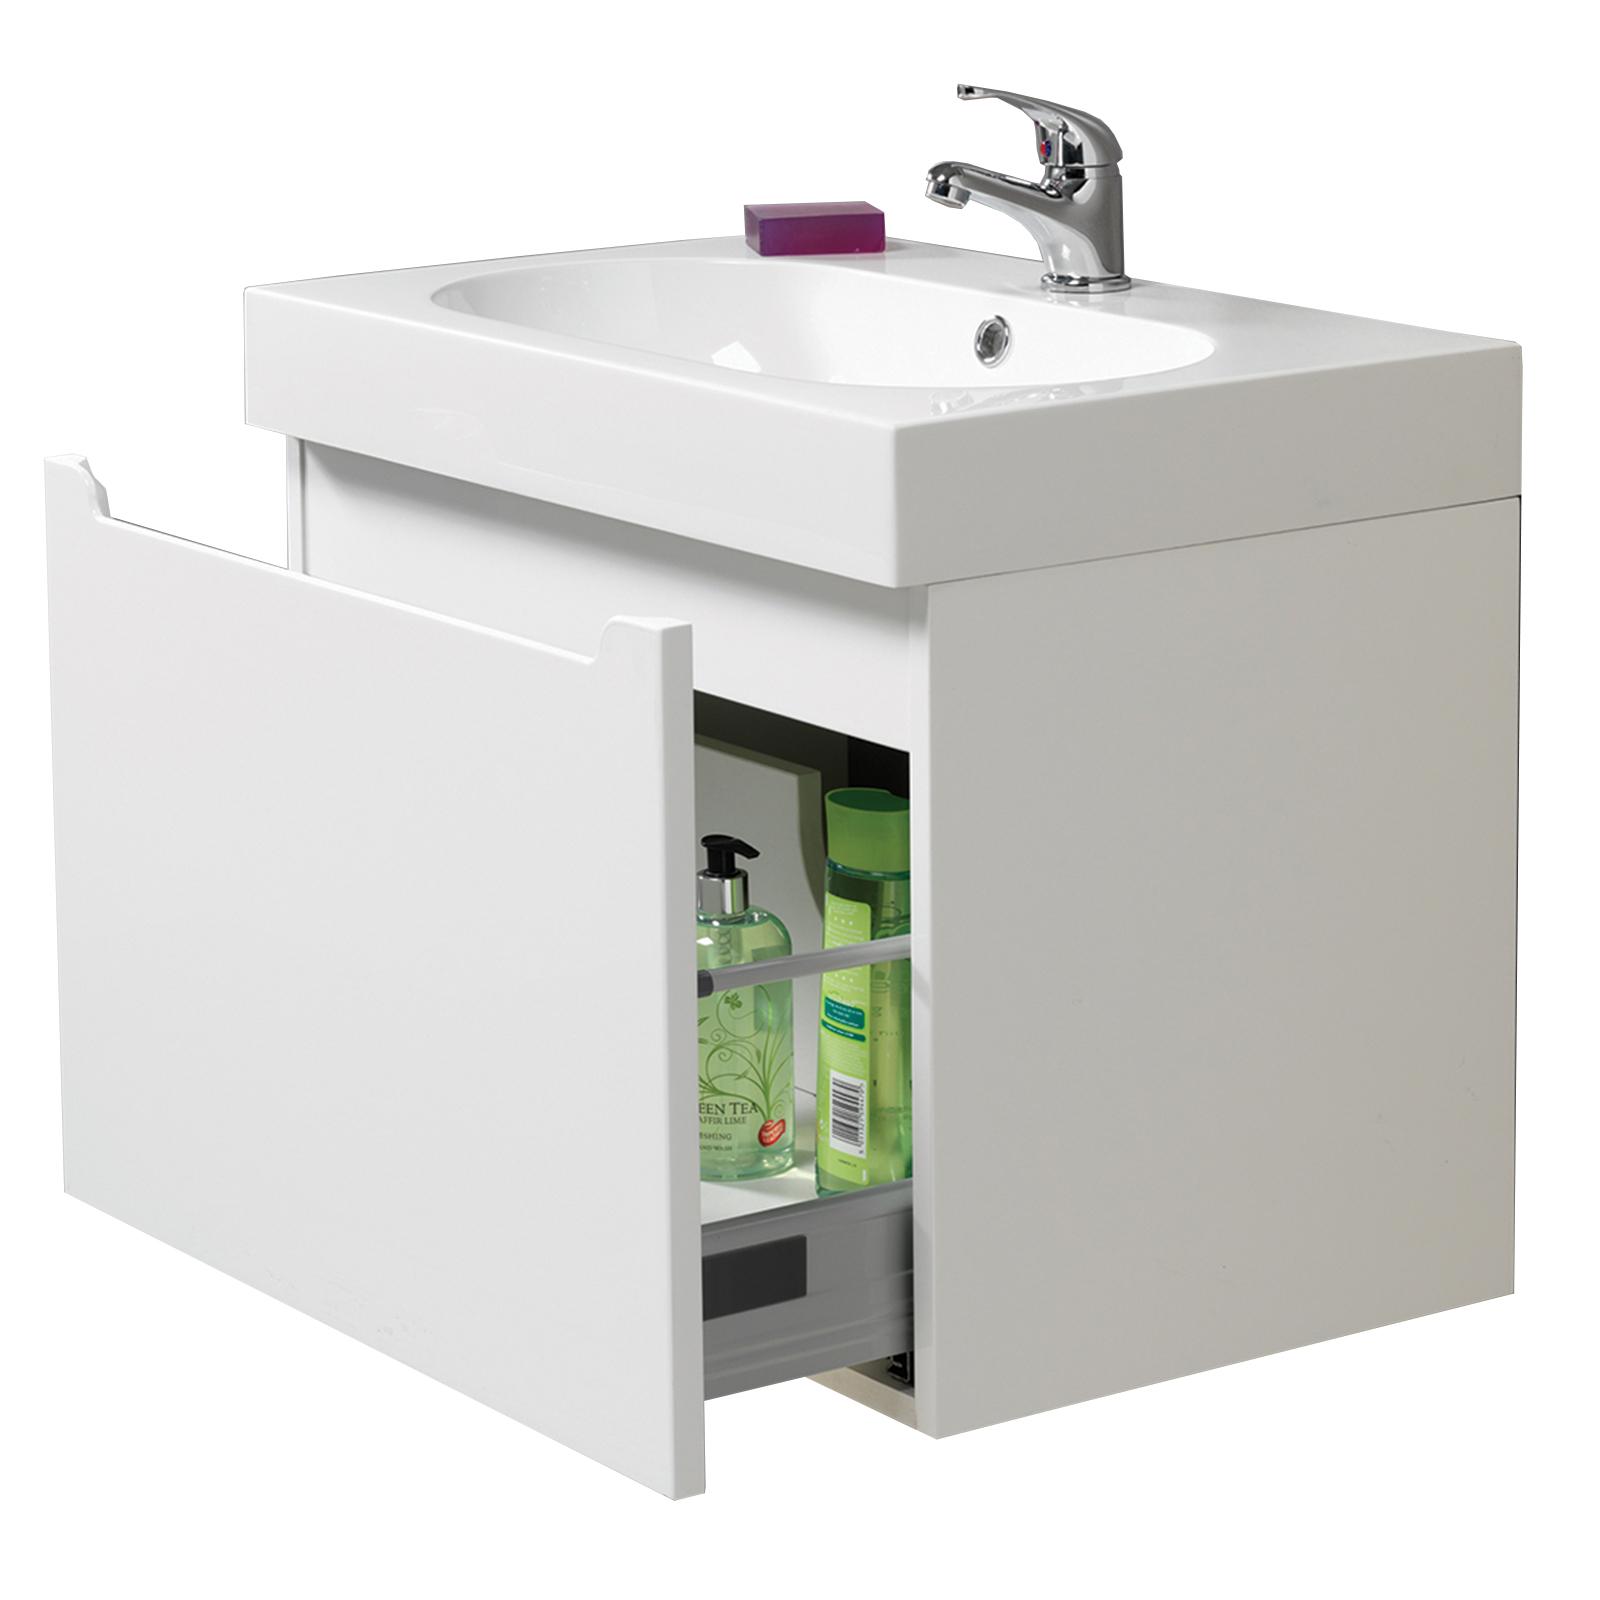 Radius 60 Wall Hung Vanity Unit Amp Basin With Tap 163 244 80